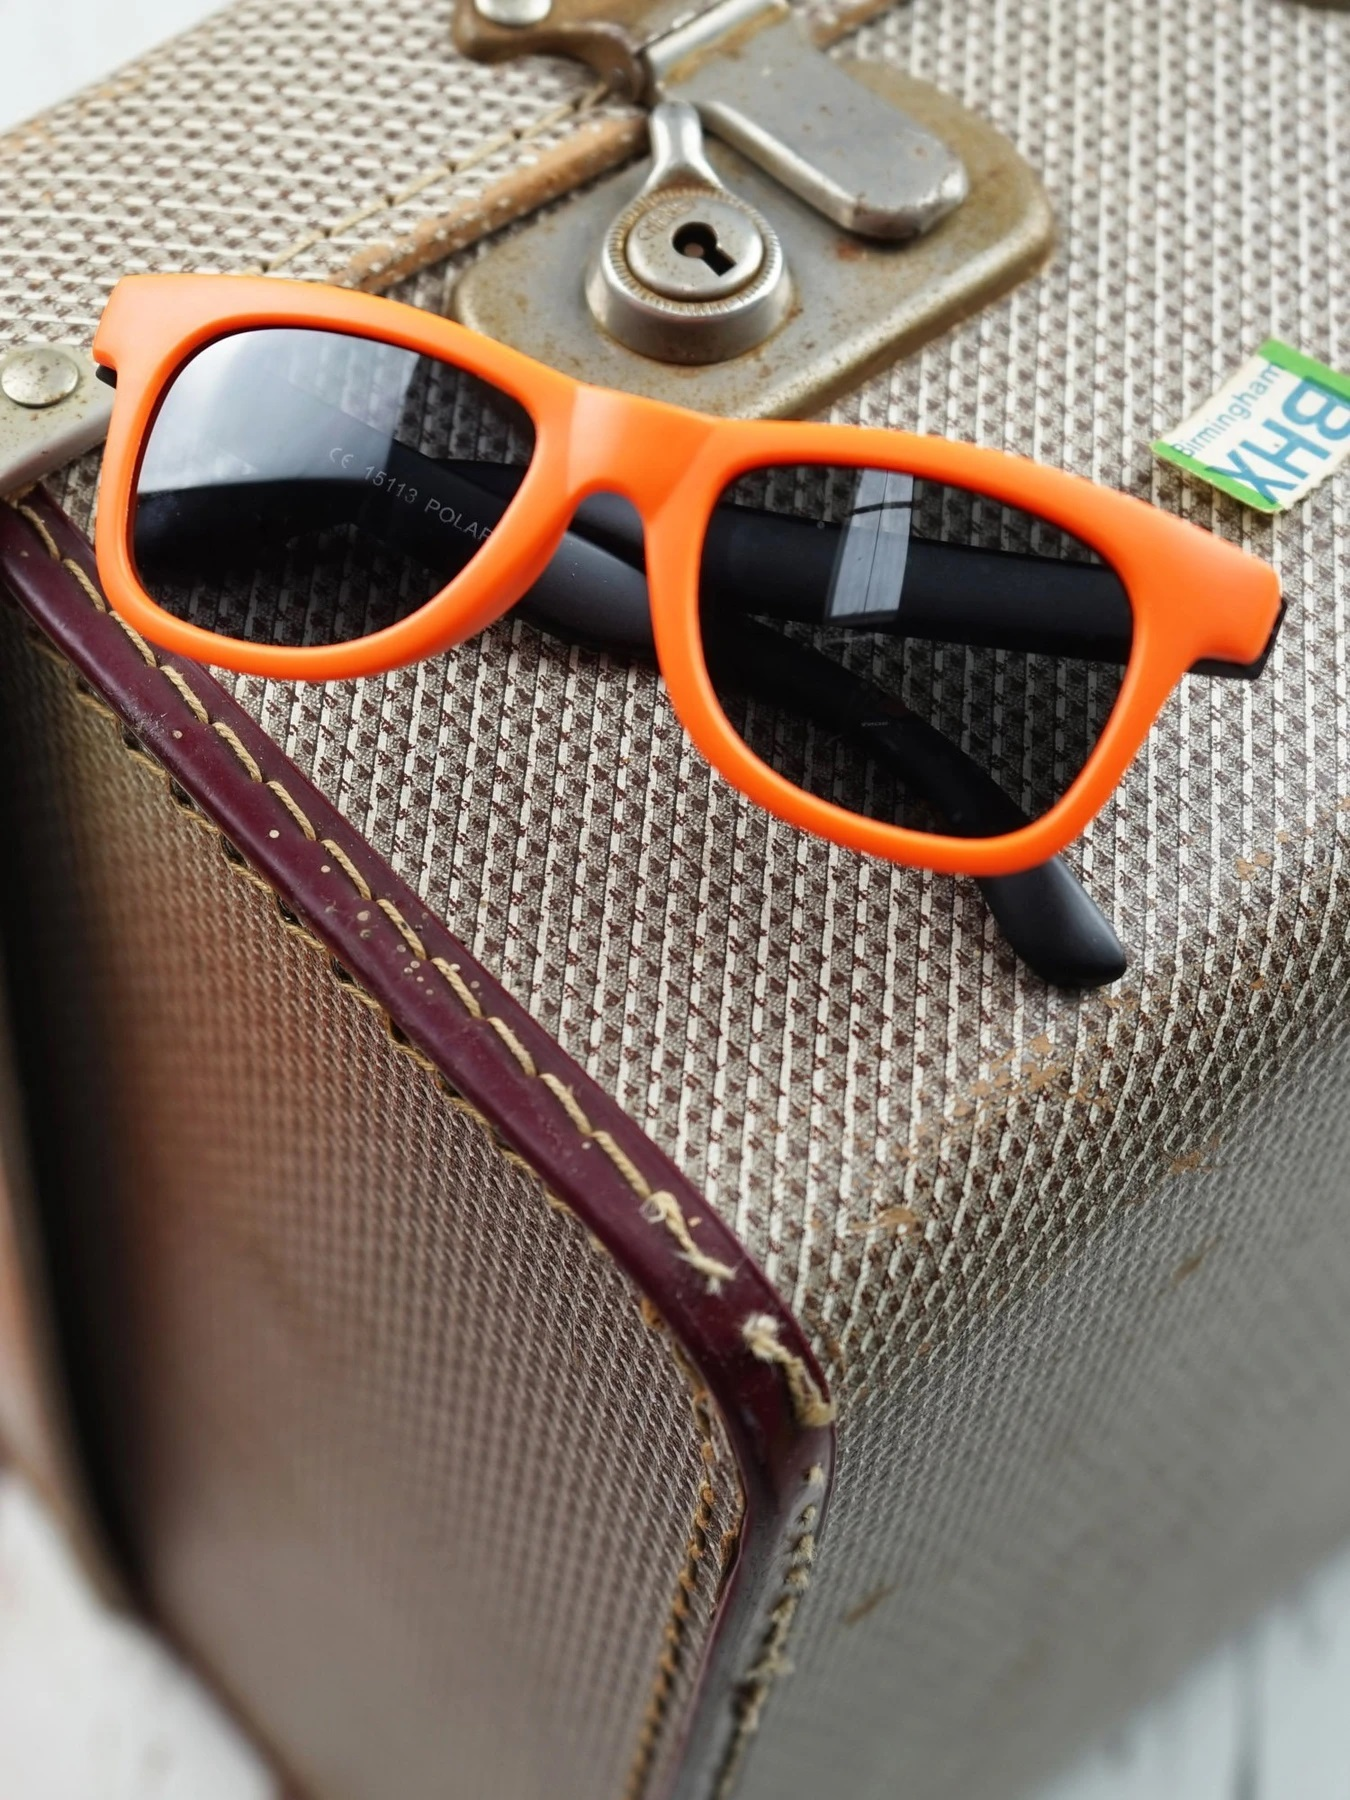 Orange_and_black_3_to_5_yrs_image_3_1800x1800